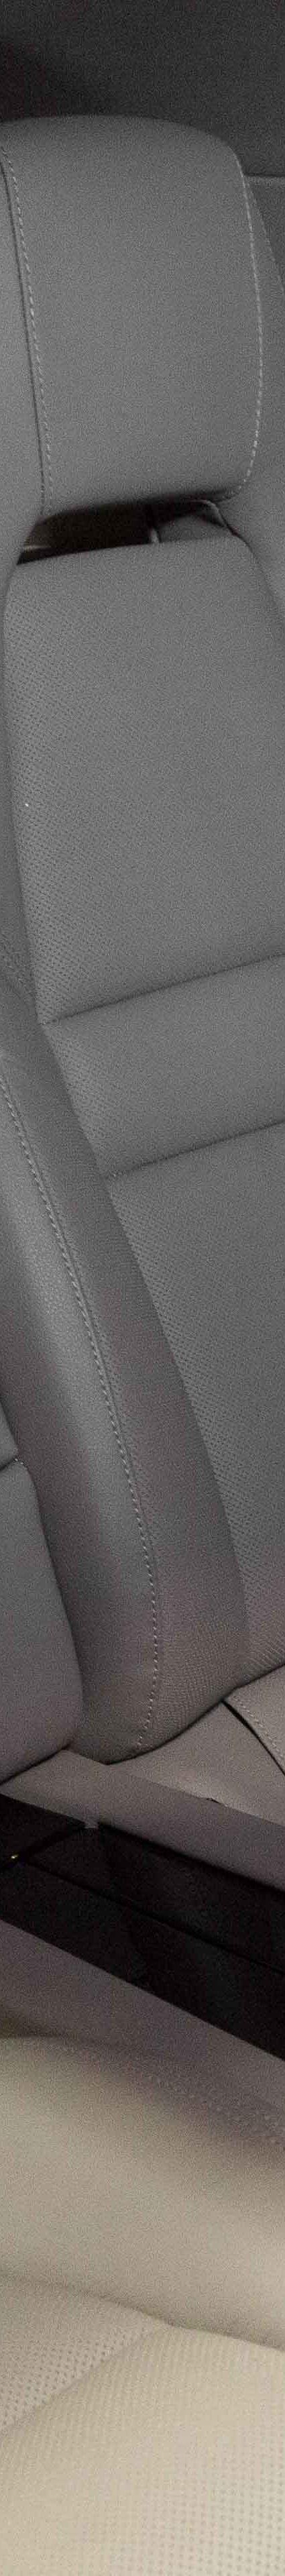 2010 PORSCHE PANAMERA 970 MY11 S GT PDK- for sale in Australia